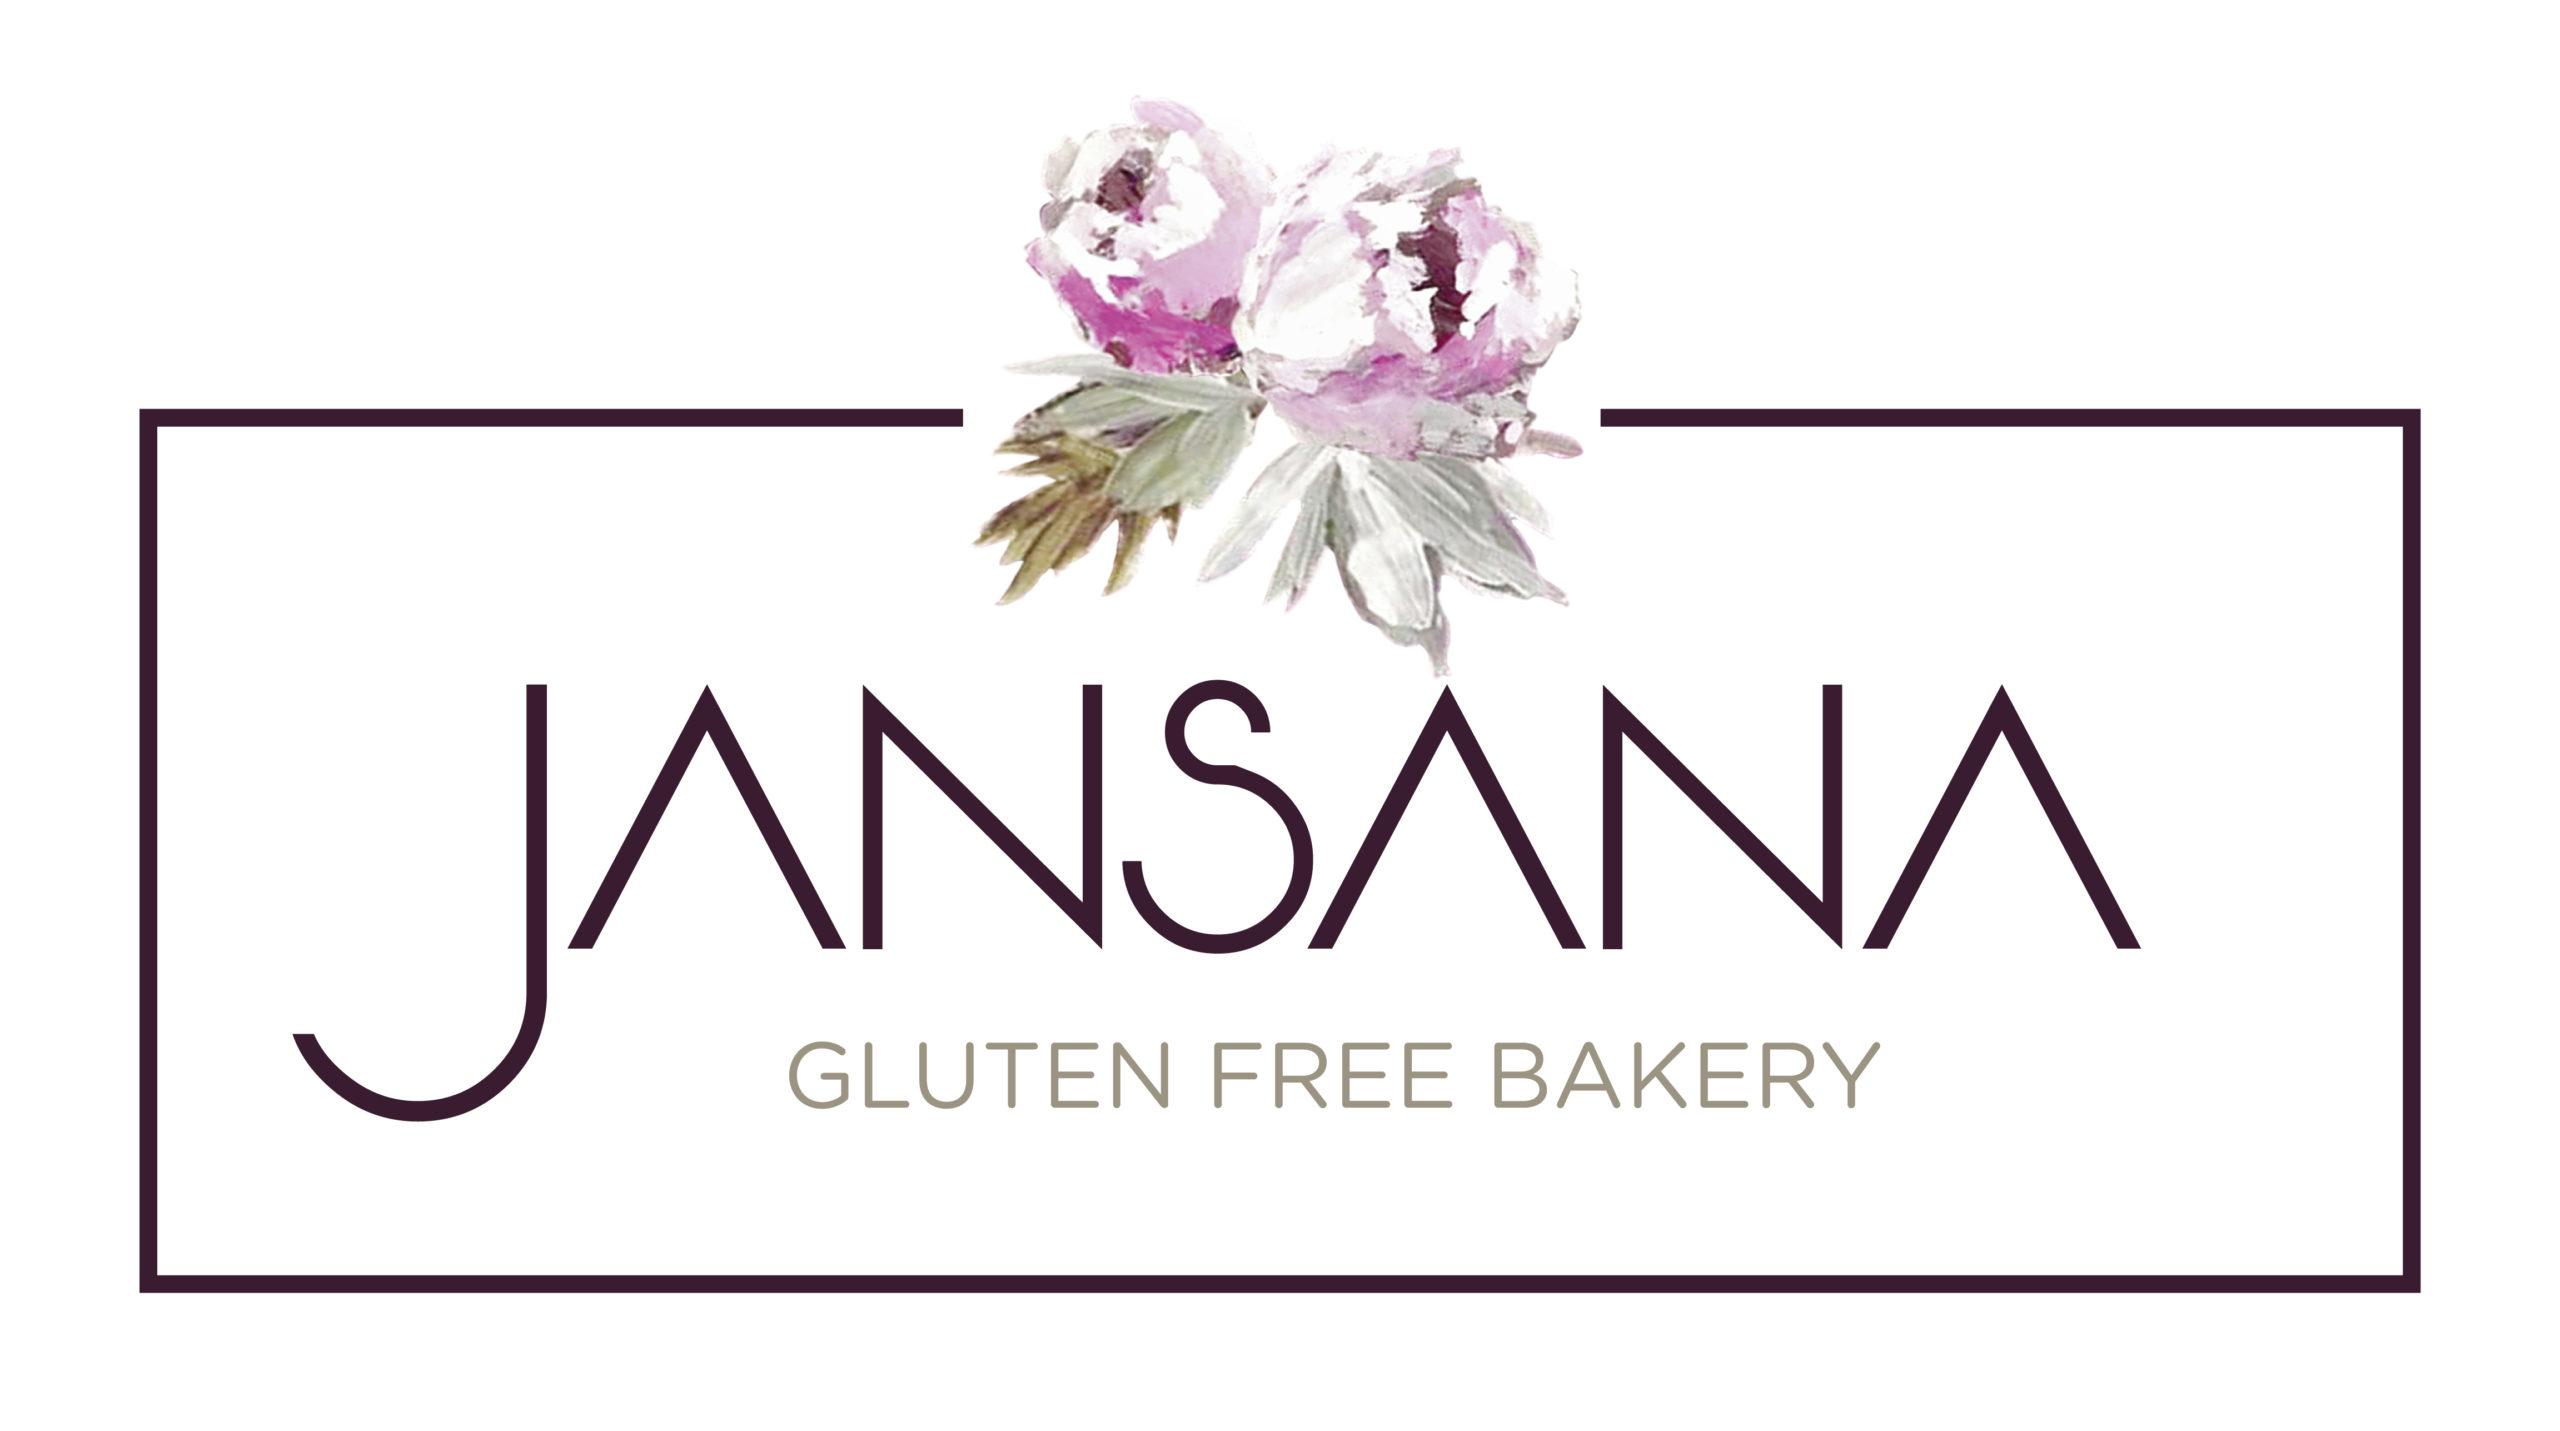 Jansana Gluten Free